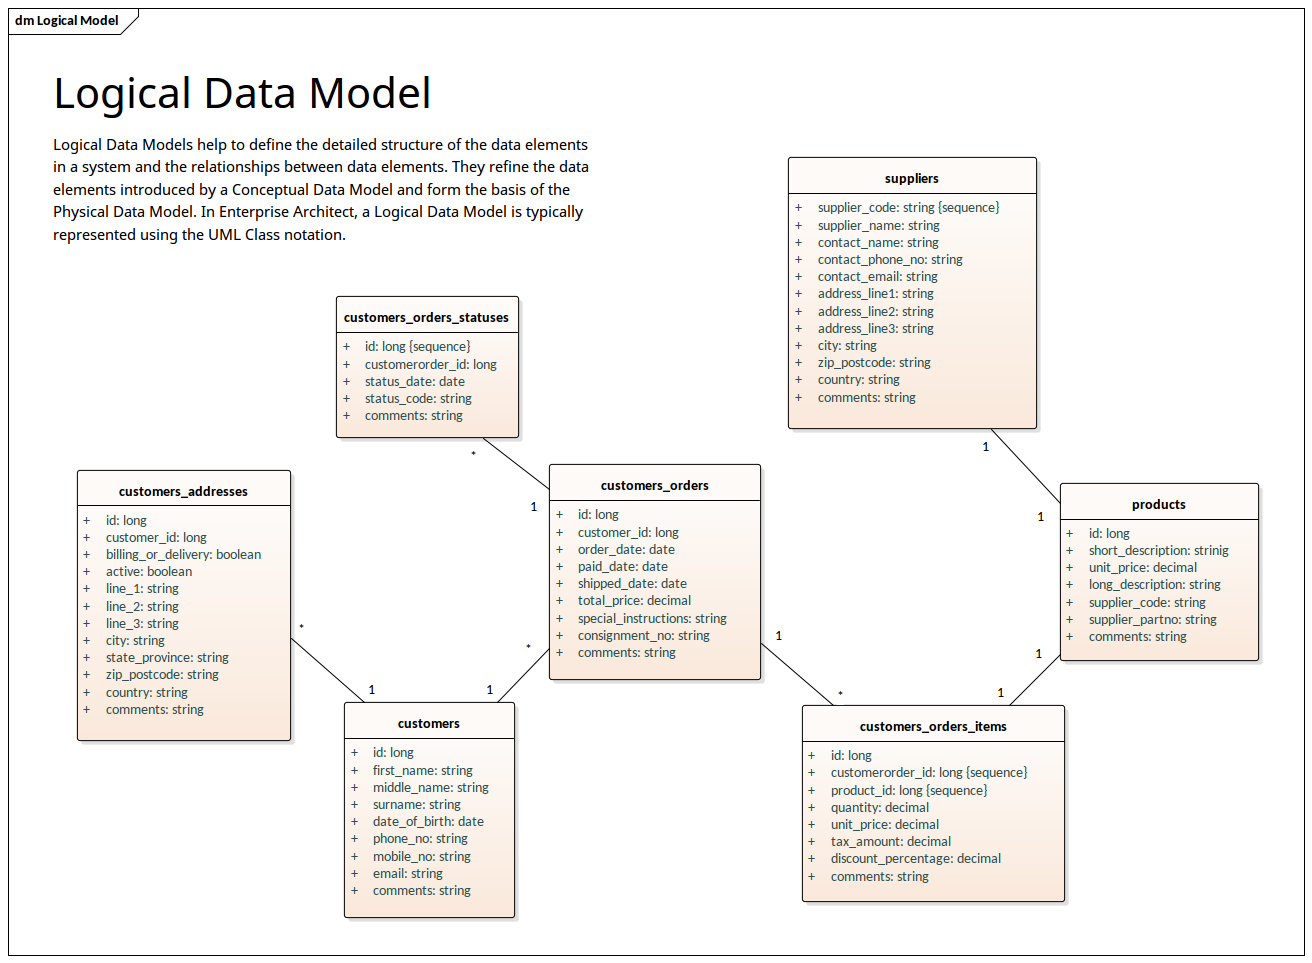 Logical Data Model - Uml Notation   Enterprise Architect throughout Data Model Diagram